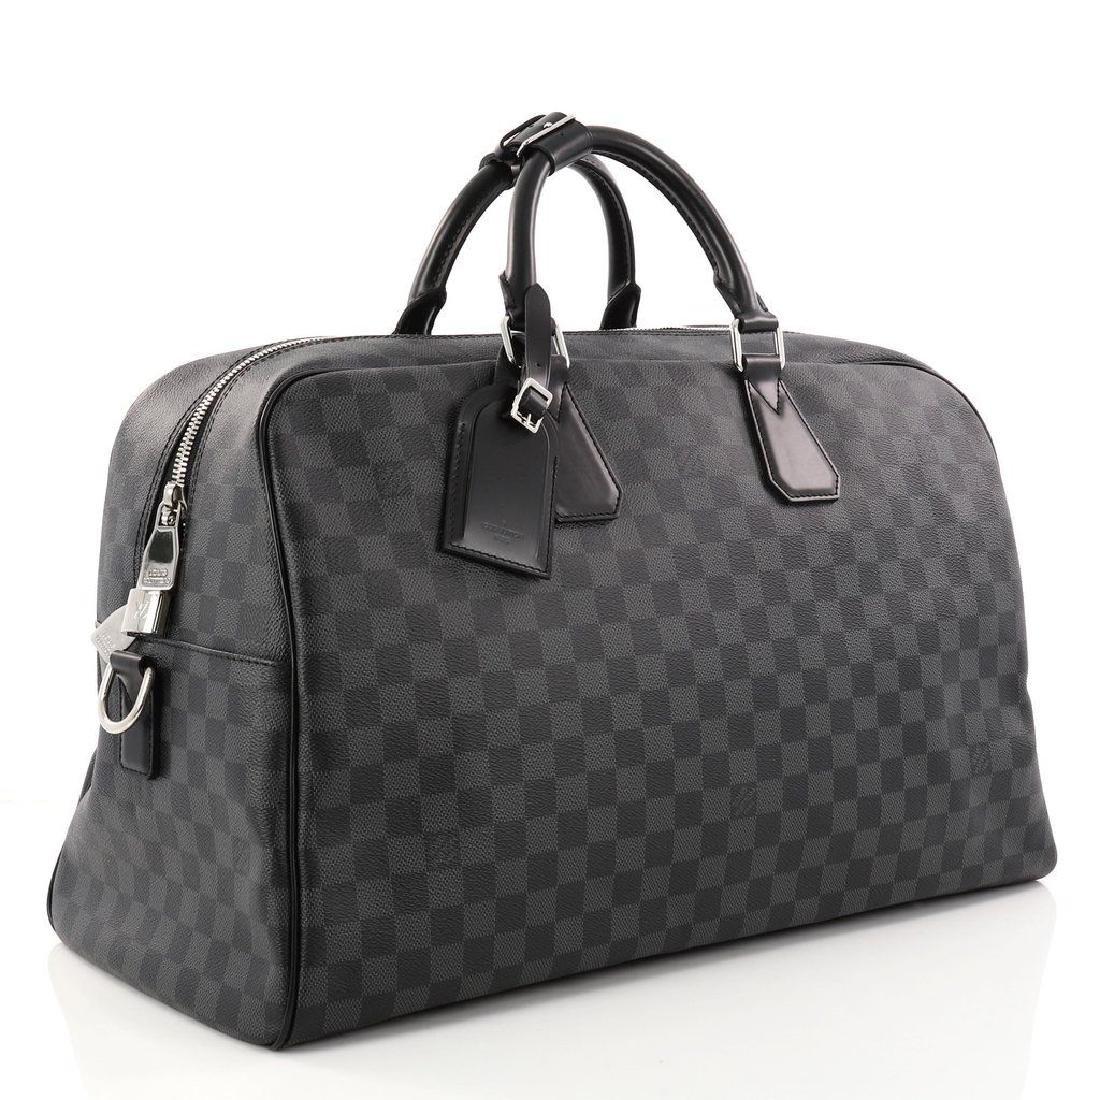 Louis Vuitton Neo Kendall Damier Graphite Duffle